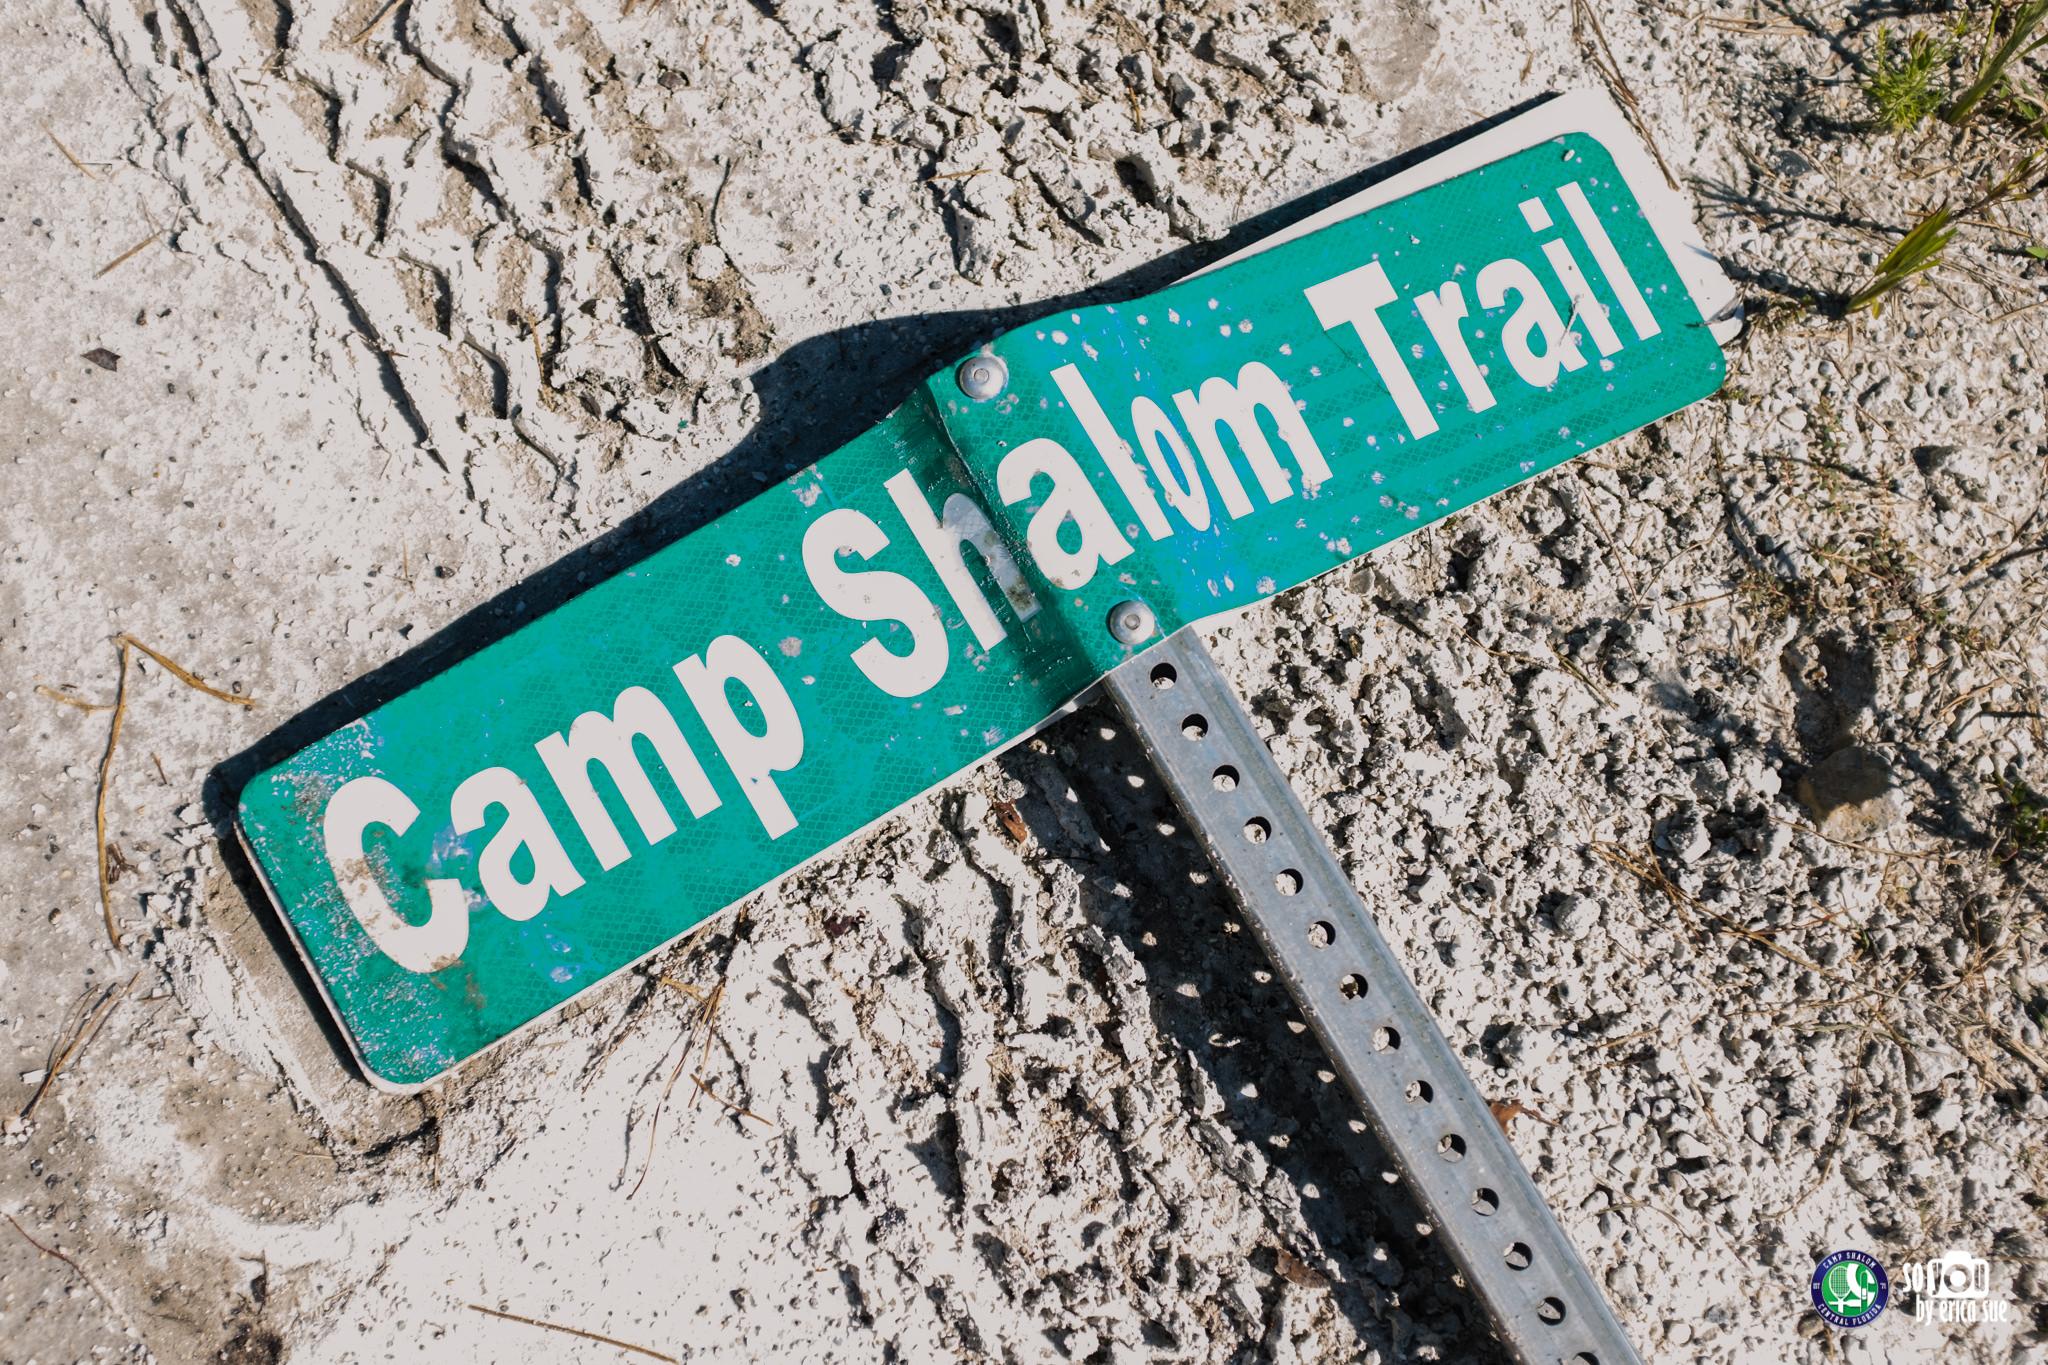 so-you-by-erica-sue-camp-shalom-central-florida-sleepaway-camp-1615.jpg